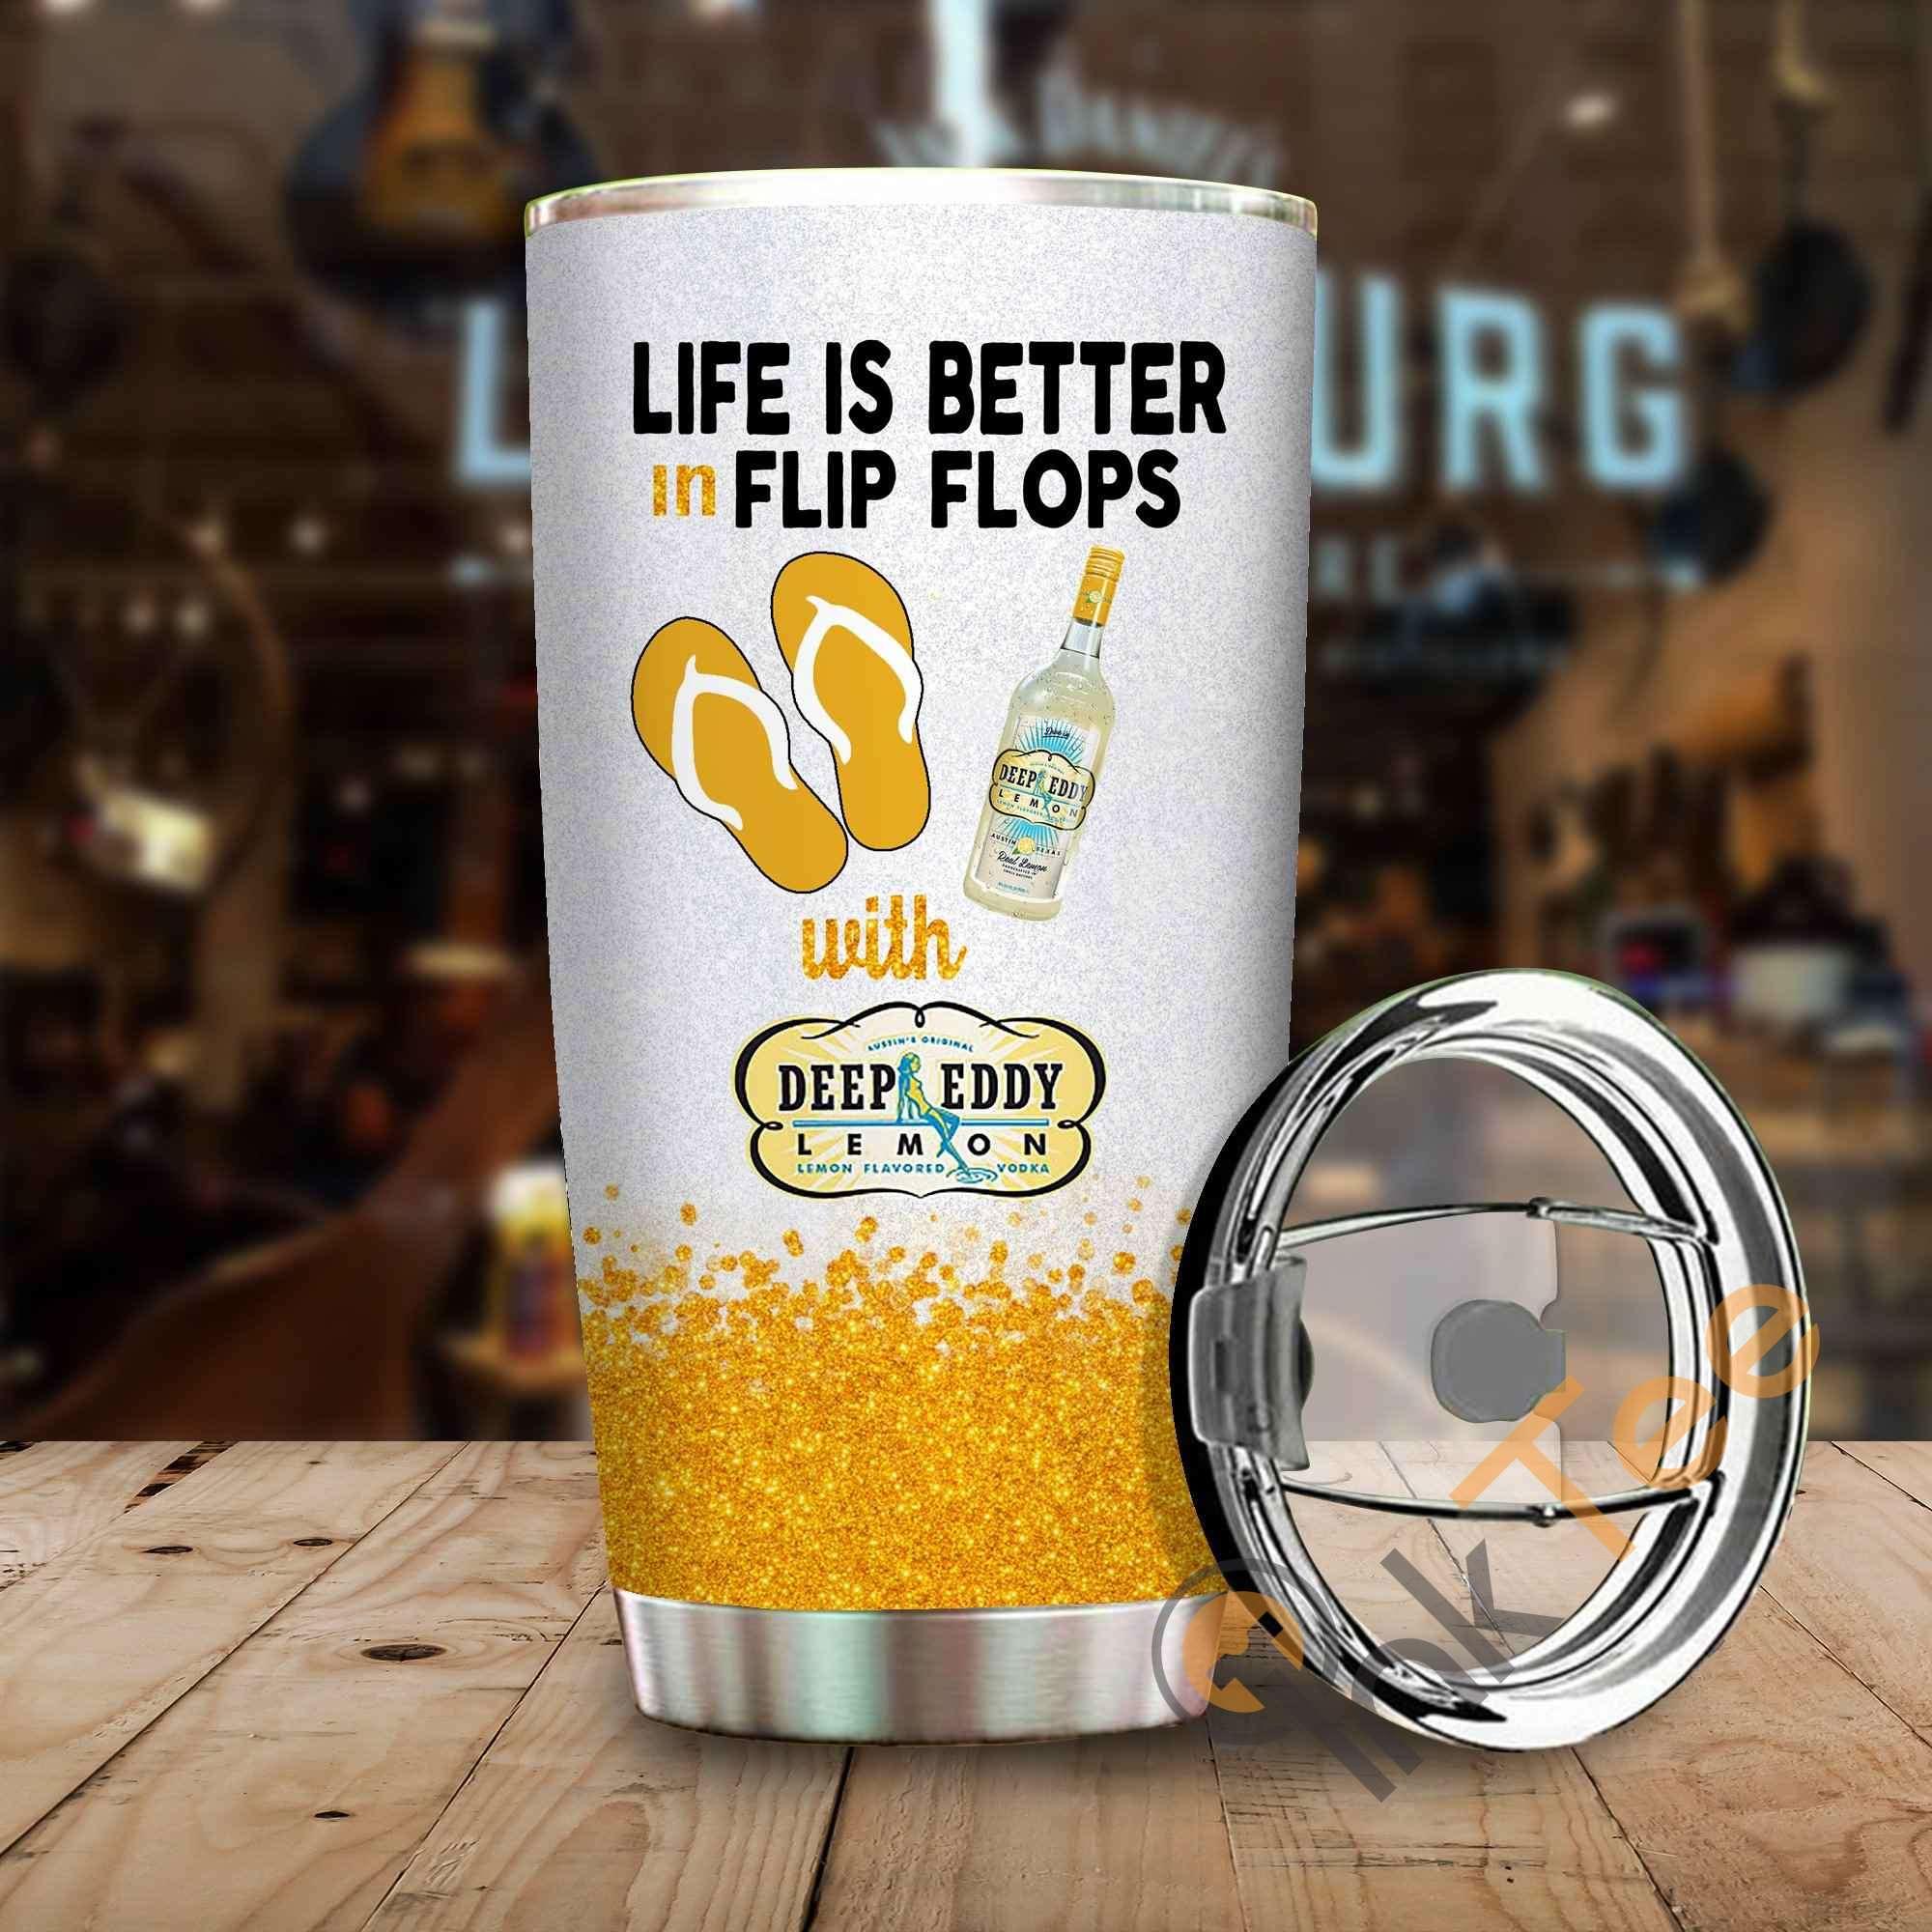 Life Is Better In Flip Flops With Deep Eddy Lemon Amazon Best Seller Sku 4072 Stainless Steel Tumbler